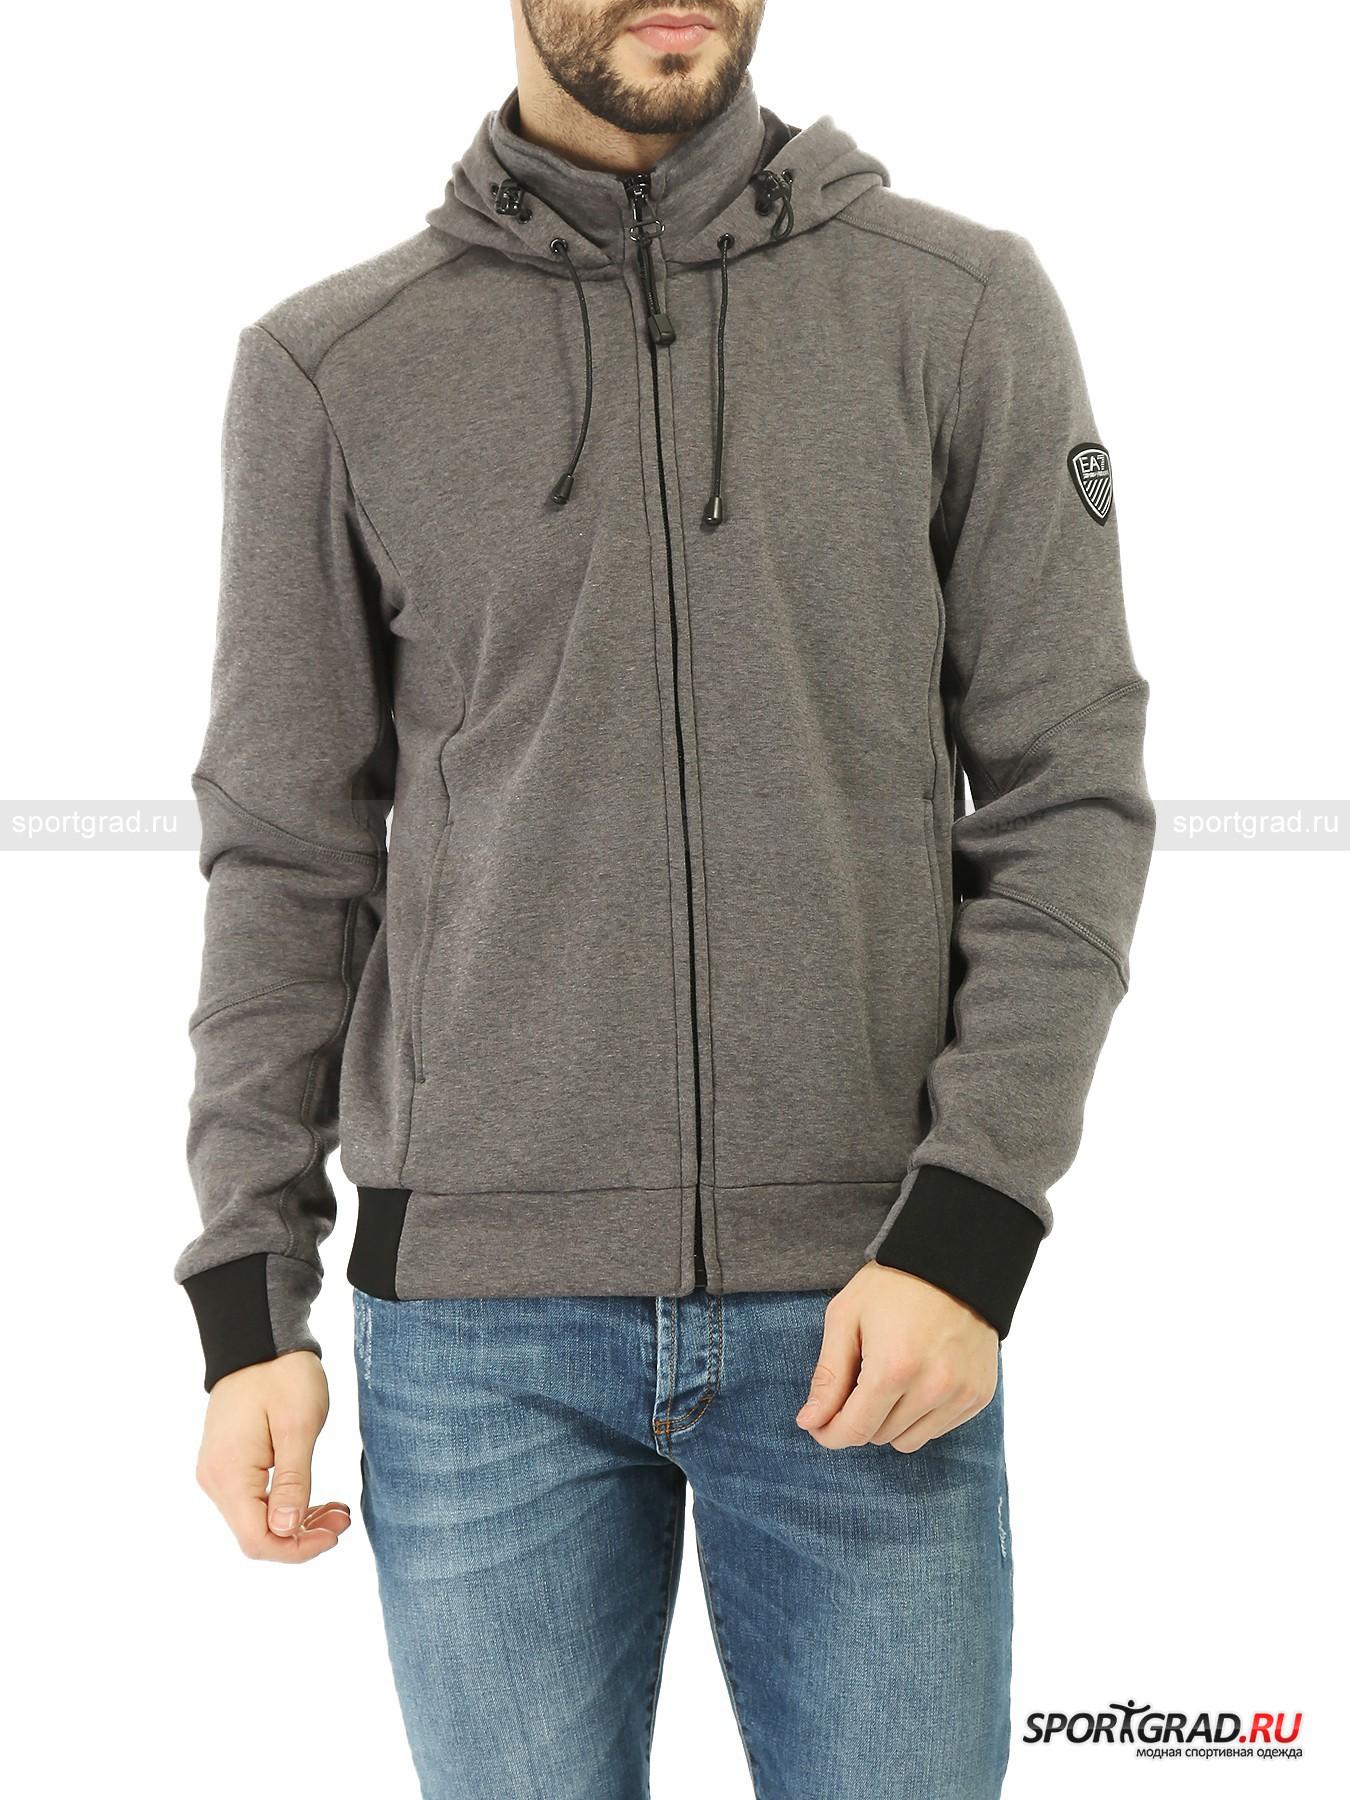 ��������� ������� Mountain Urban Hoodie Sweatshirt EA7 EMPORIO ARMANI